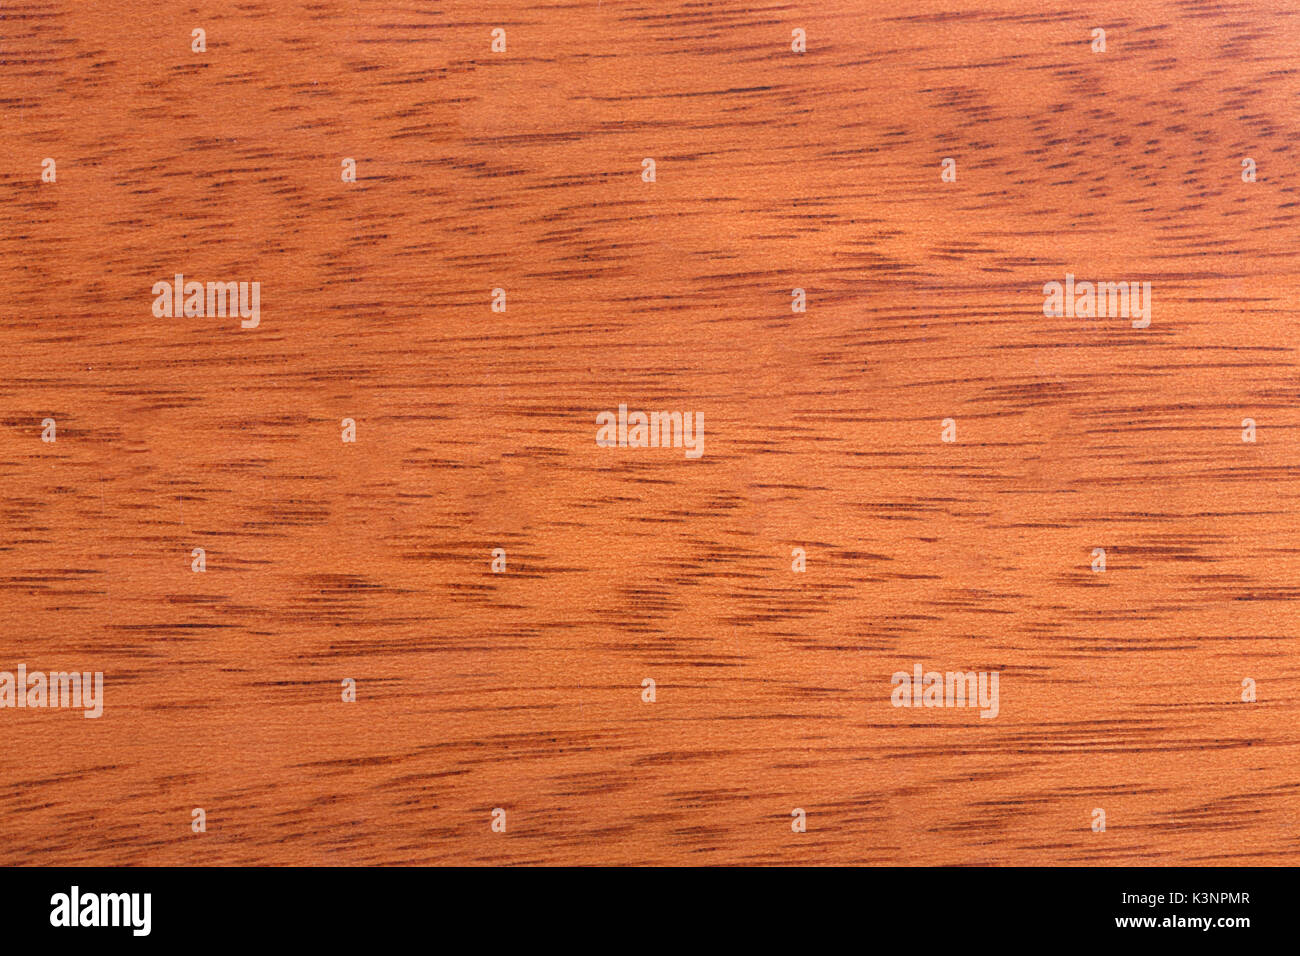 Teak Wood Texture Stock Photos Teak Wood Texture Stock